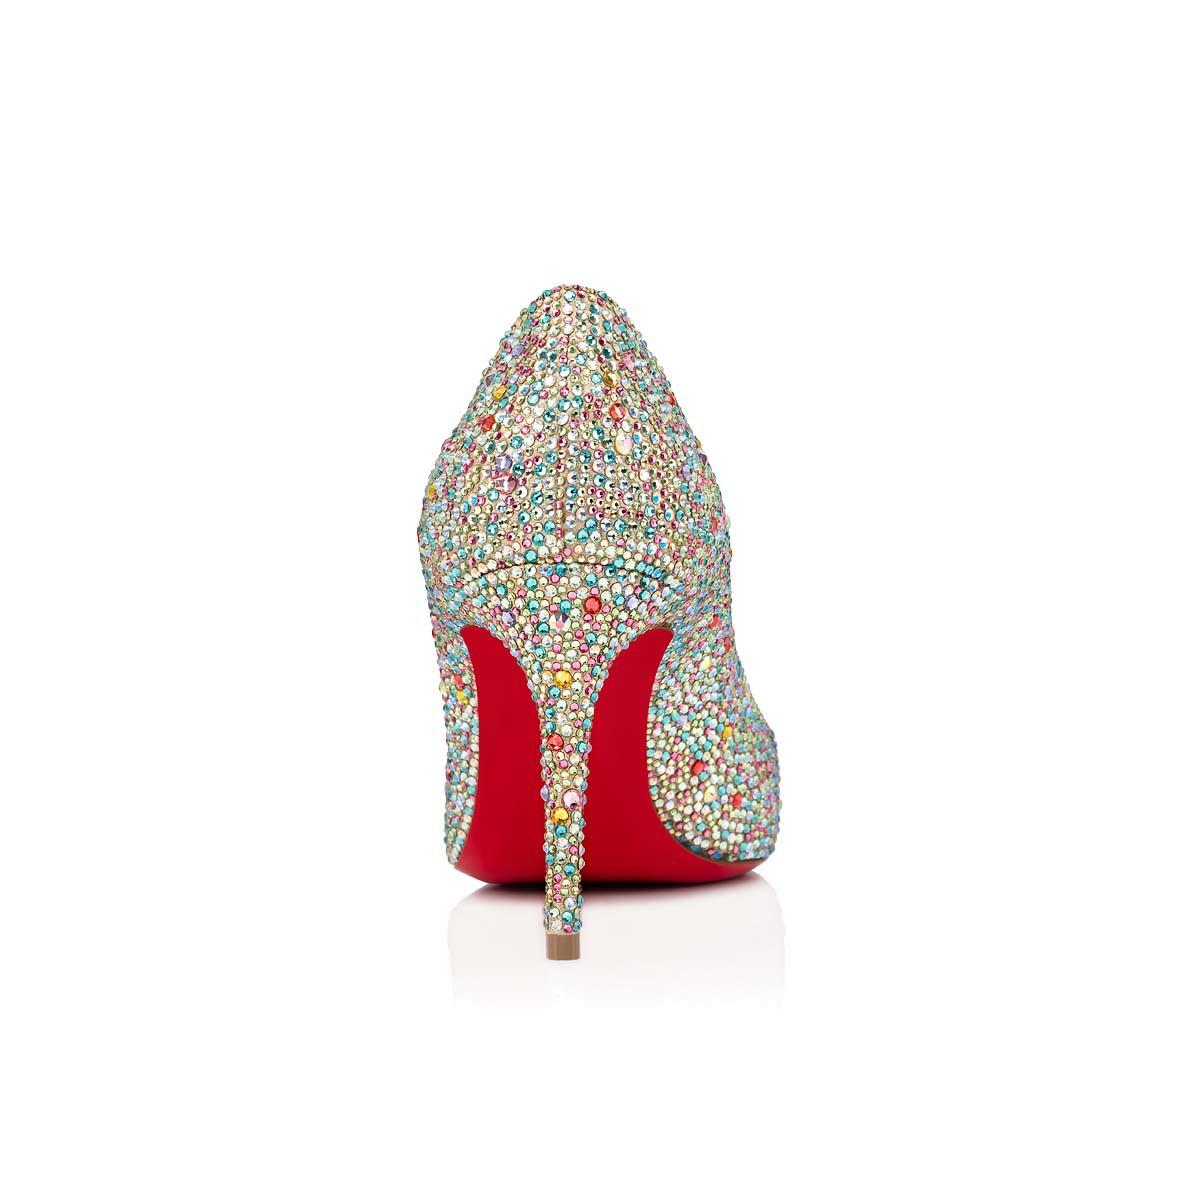 鞋履 - Kate Strass - Christian Louboutin